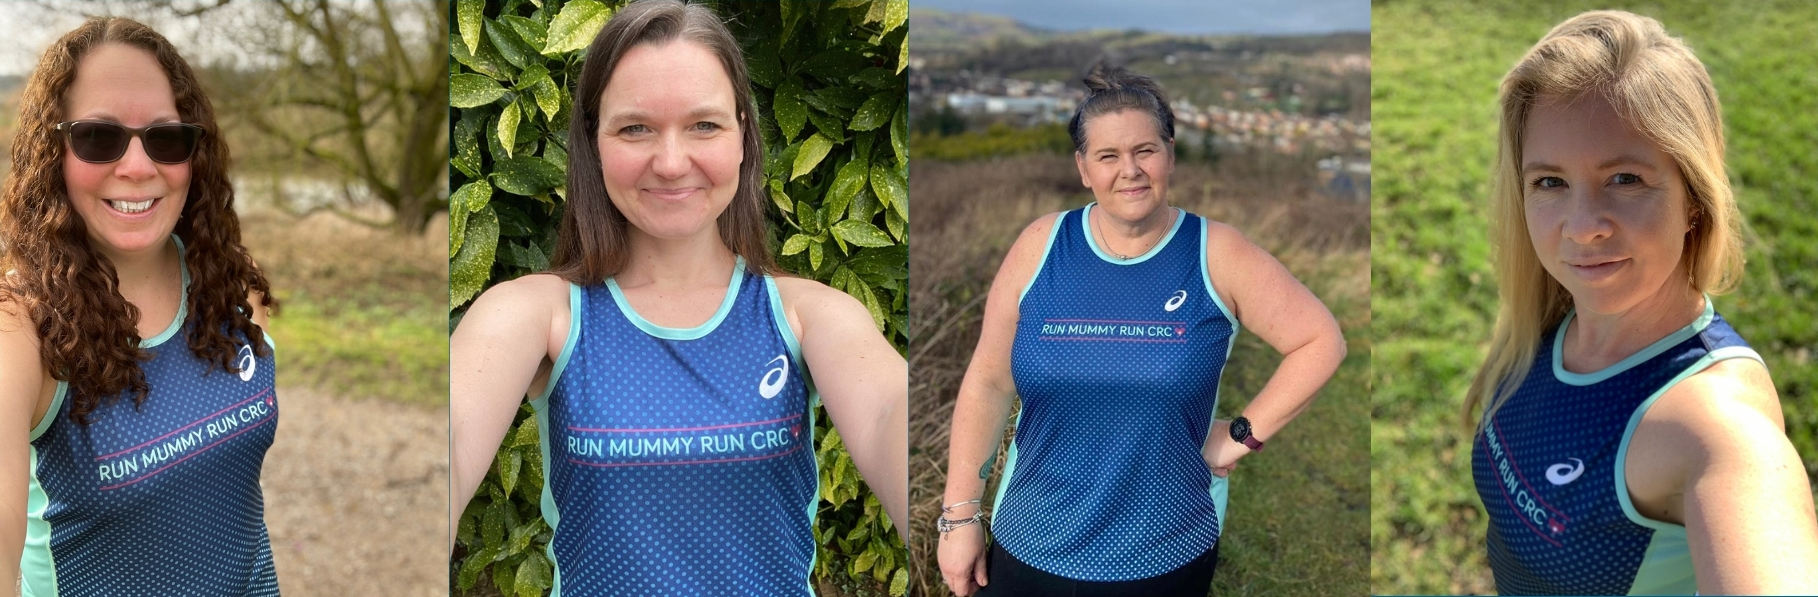 Run Mummy Run is launching its very own Community Run Club with ASICS